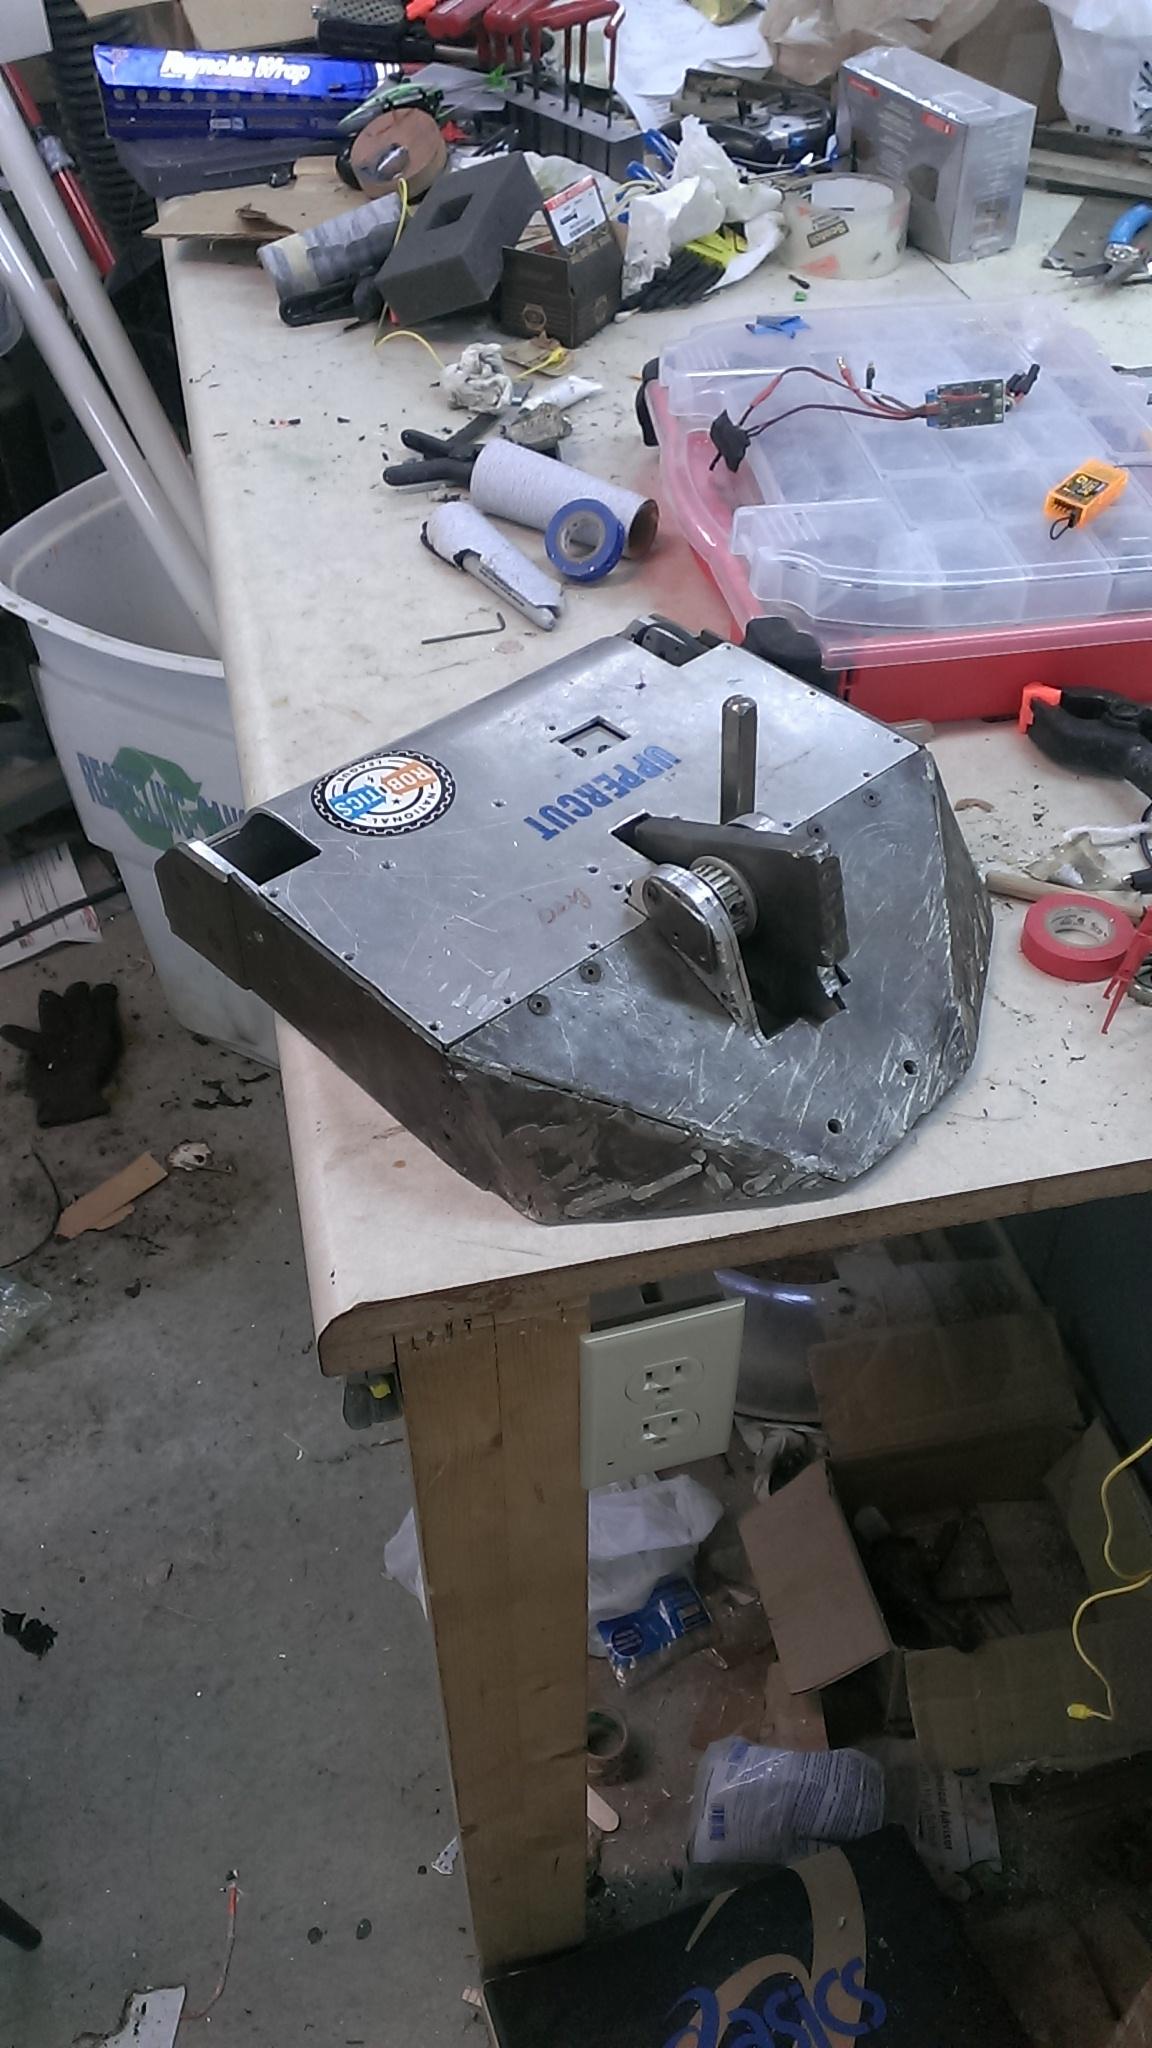 New 15 pound beater bot IMAG3300